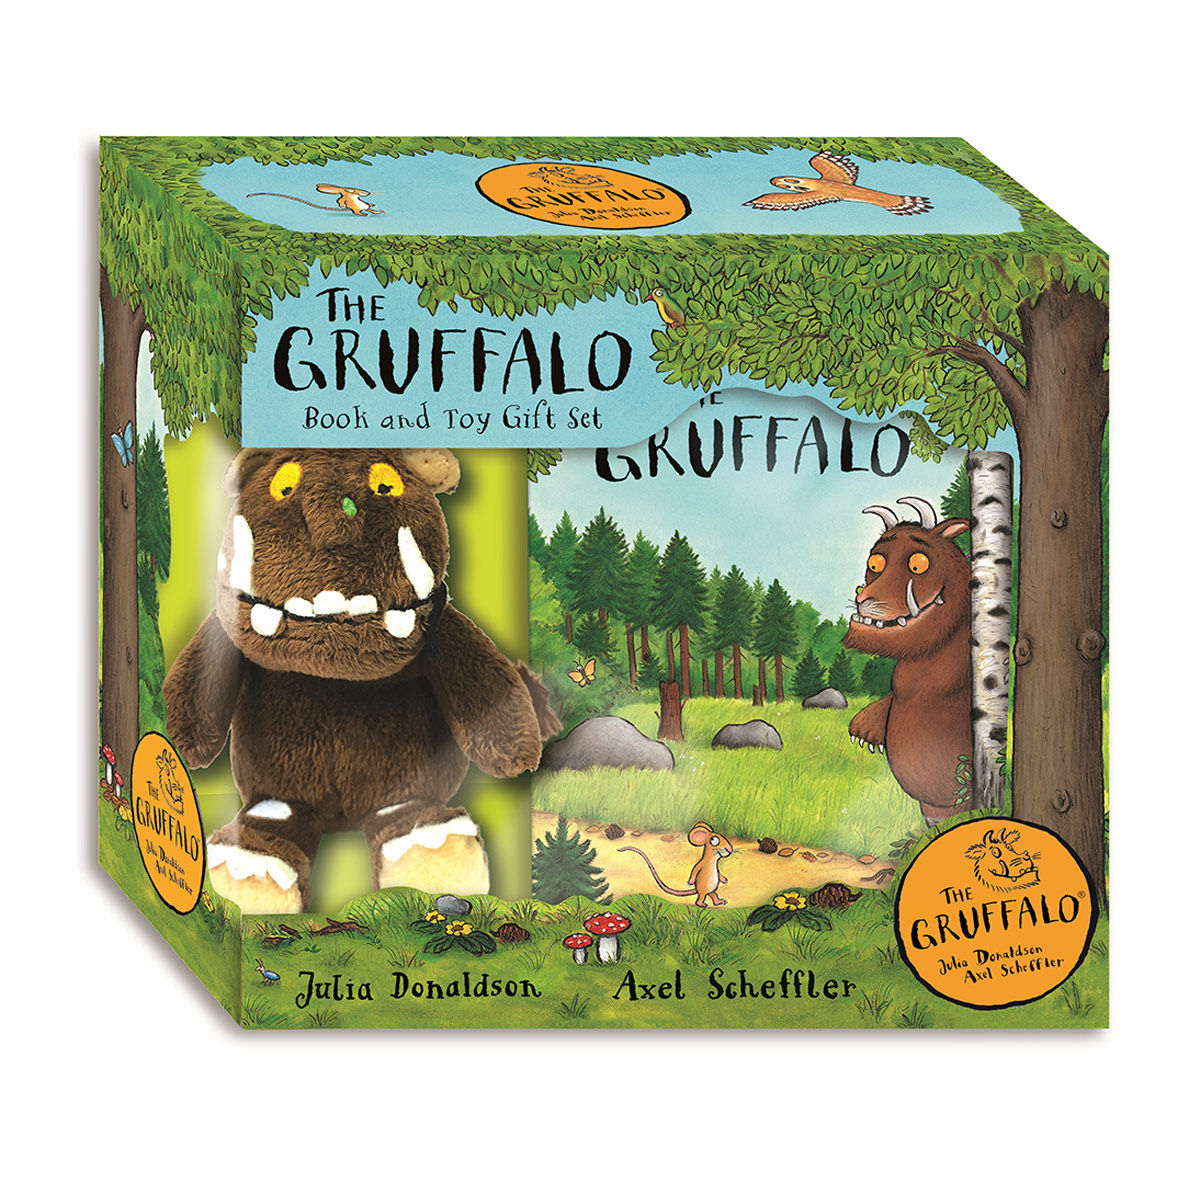 Children's Books The Gruffalo The Gruffalo Book and Toy Gift Set